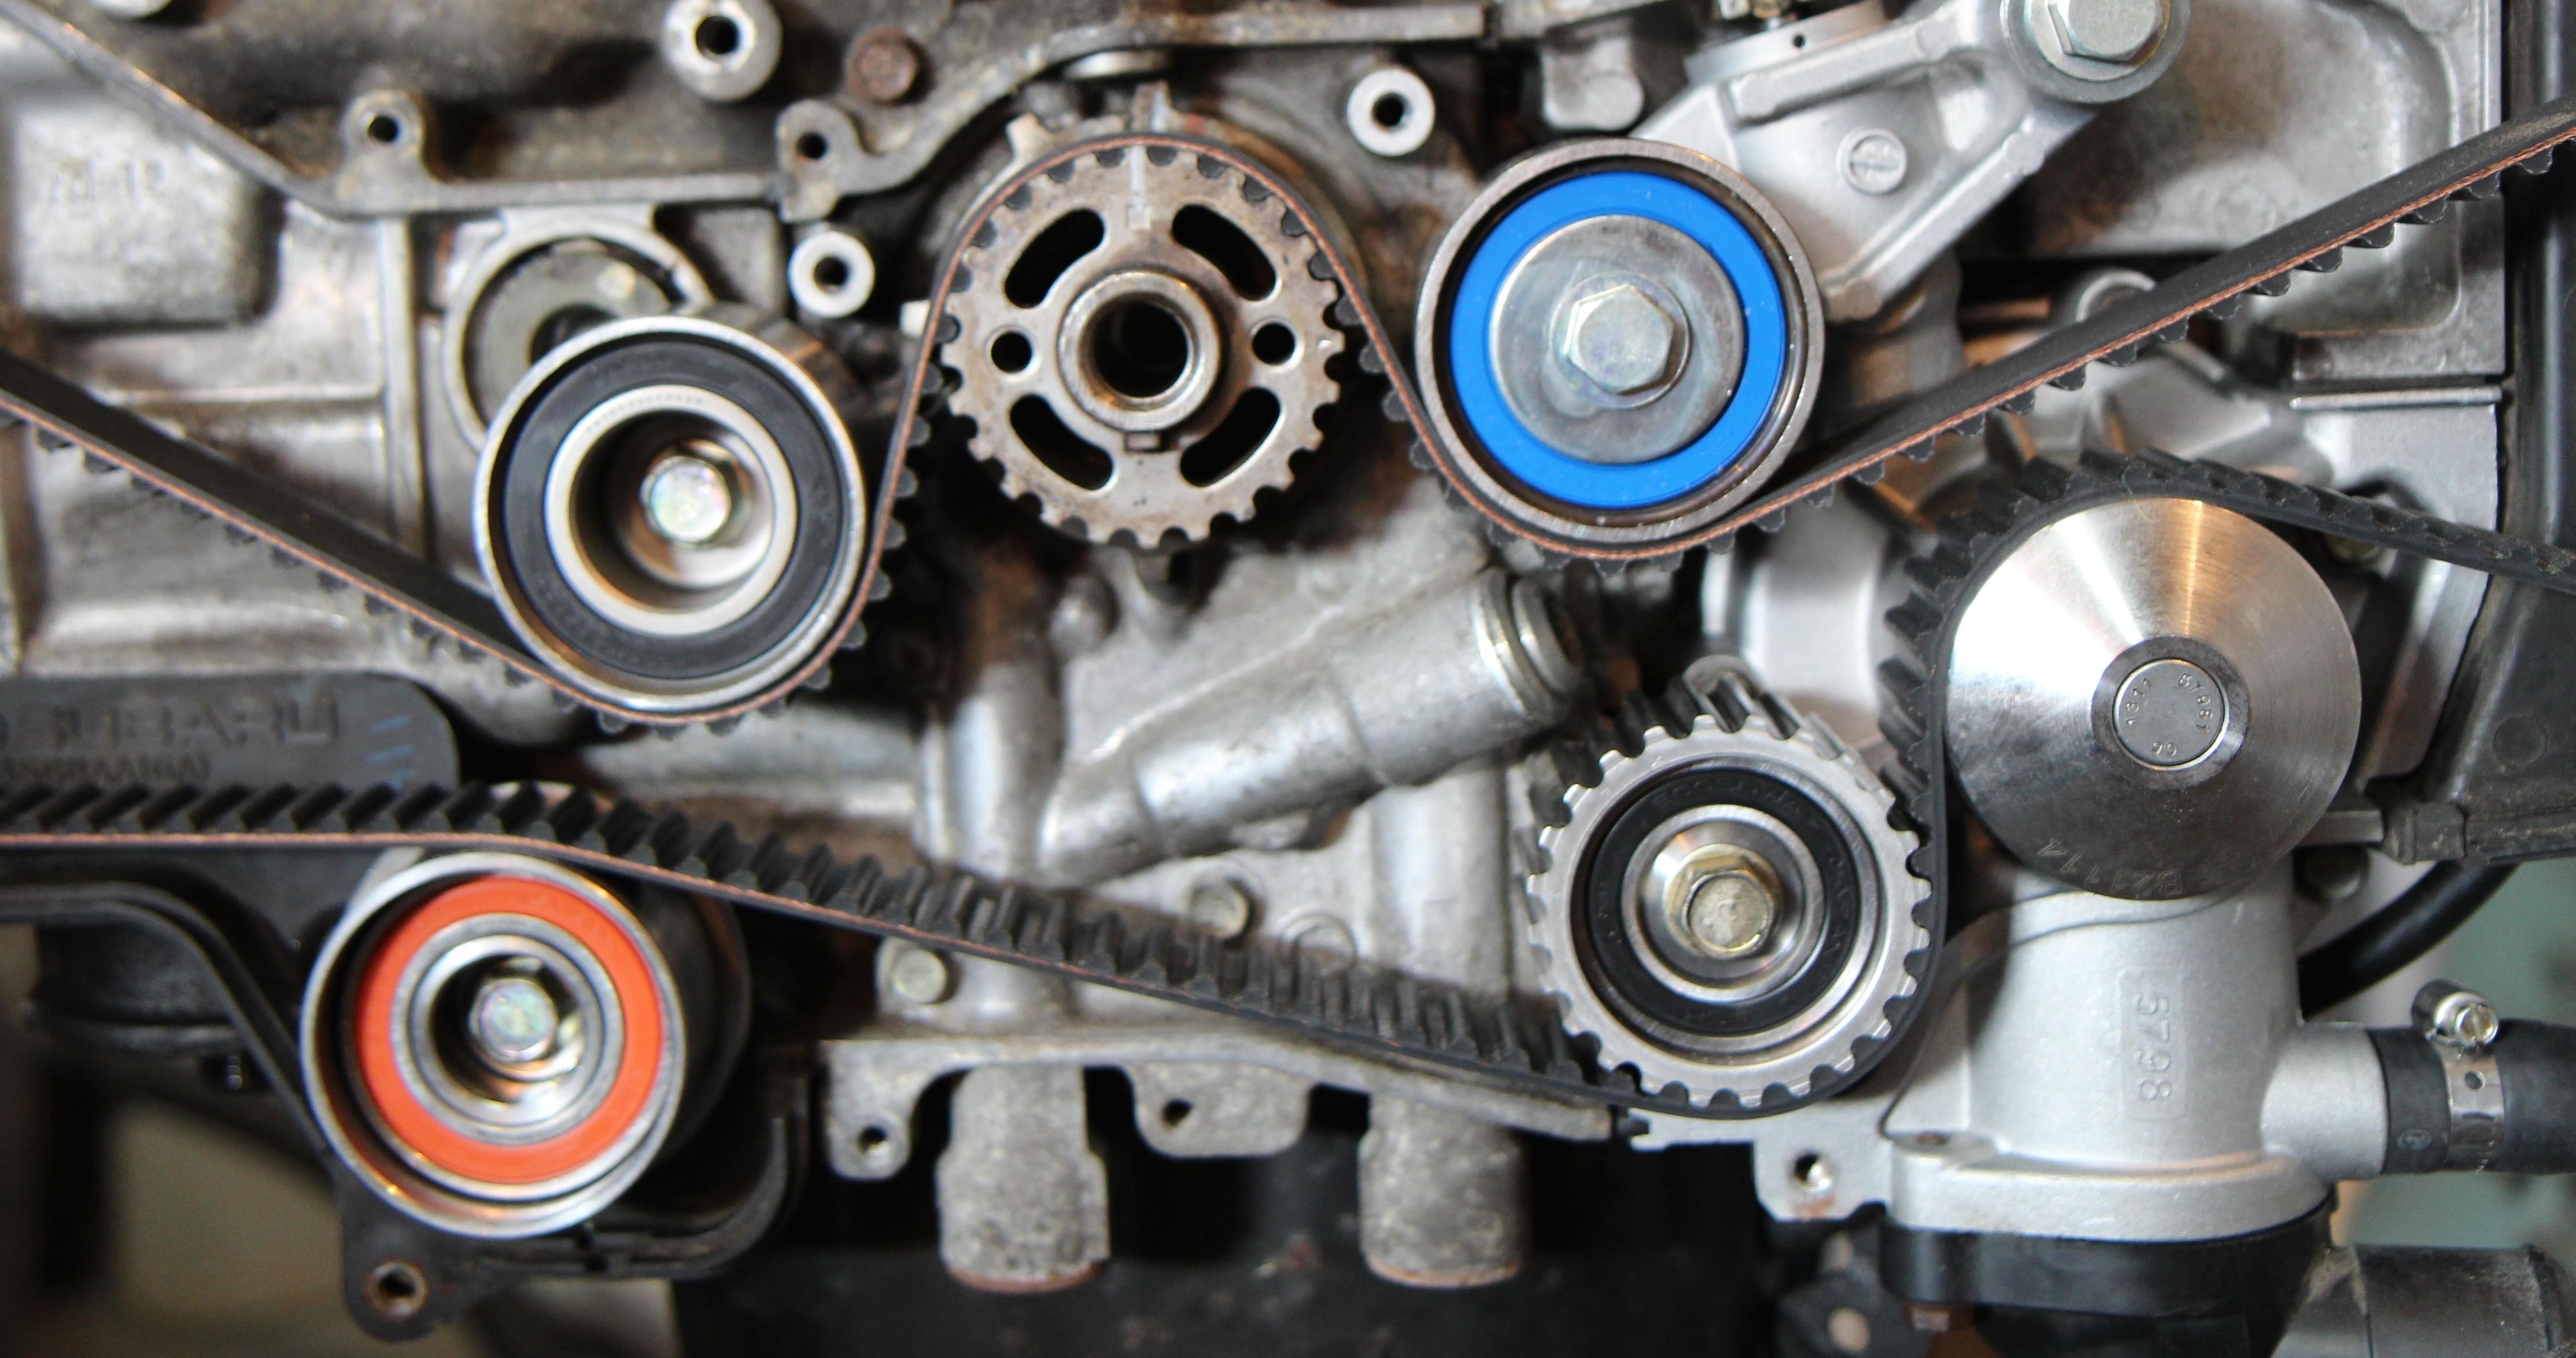 Subaru 2 5 Engine Diagram O2 Sensor Wiring Oxygen With Blueprint Legacy Of Related Post